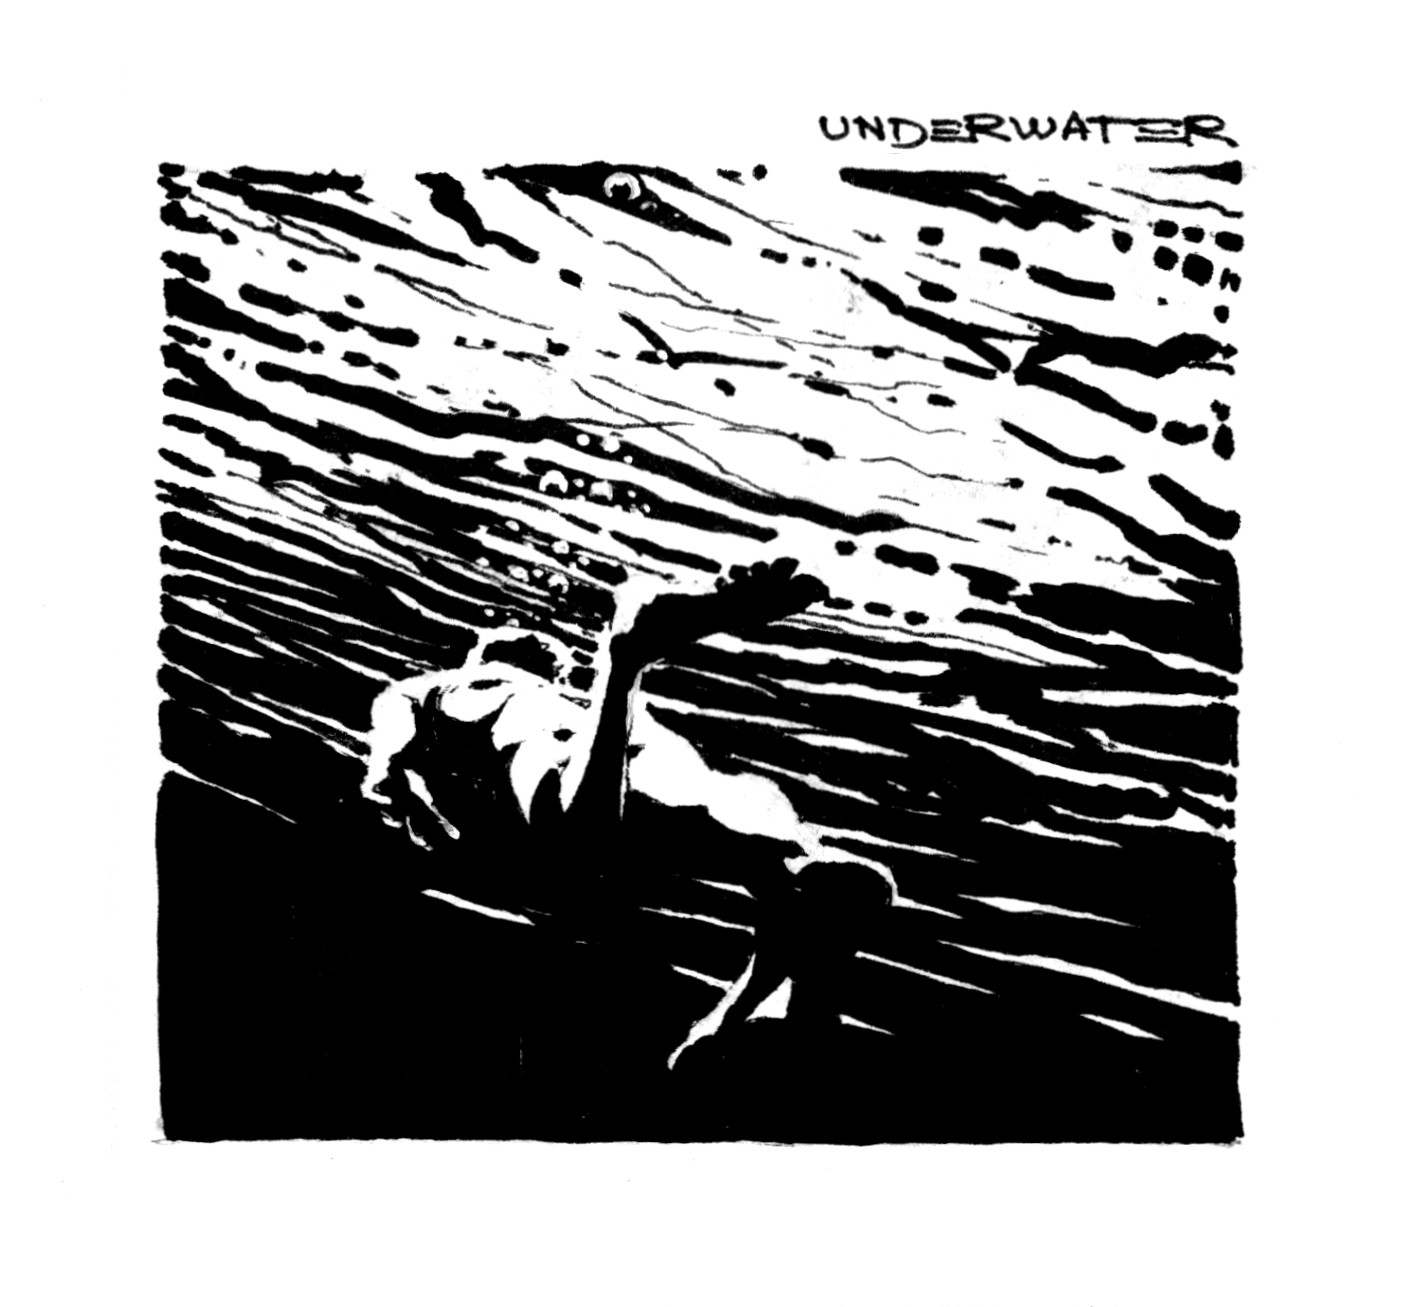 Midhat kapetanovic 04 underwater inktober2017